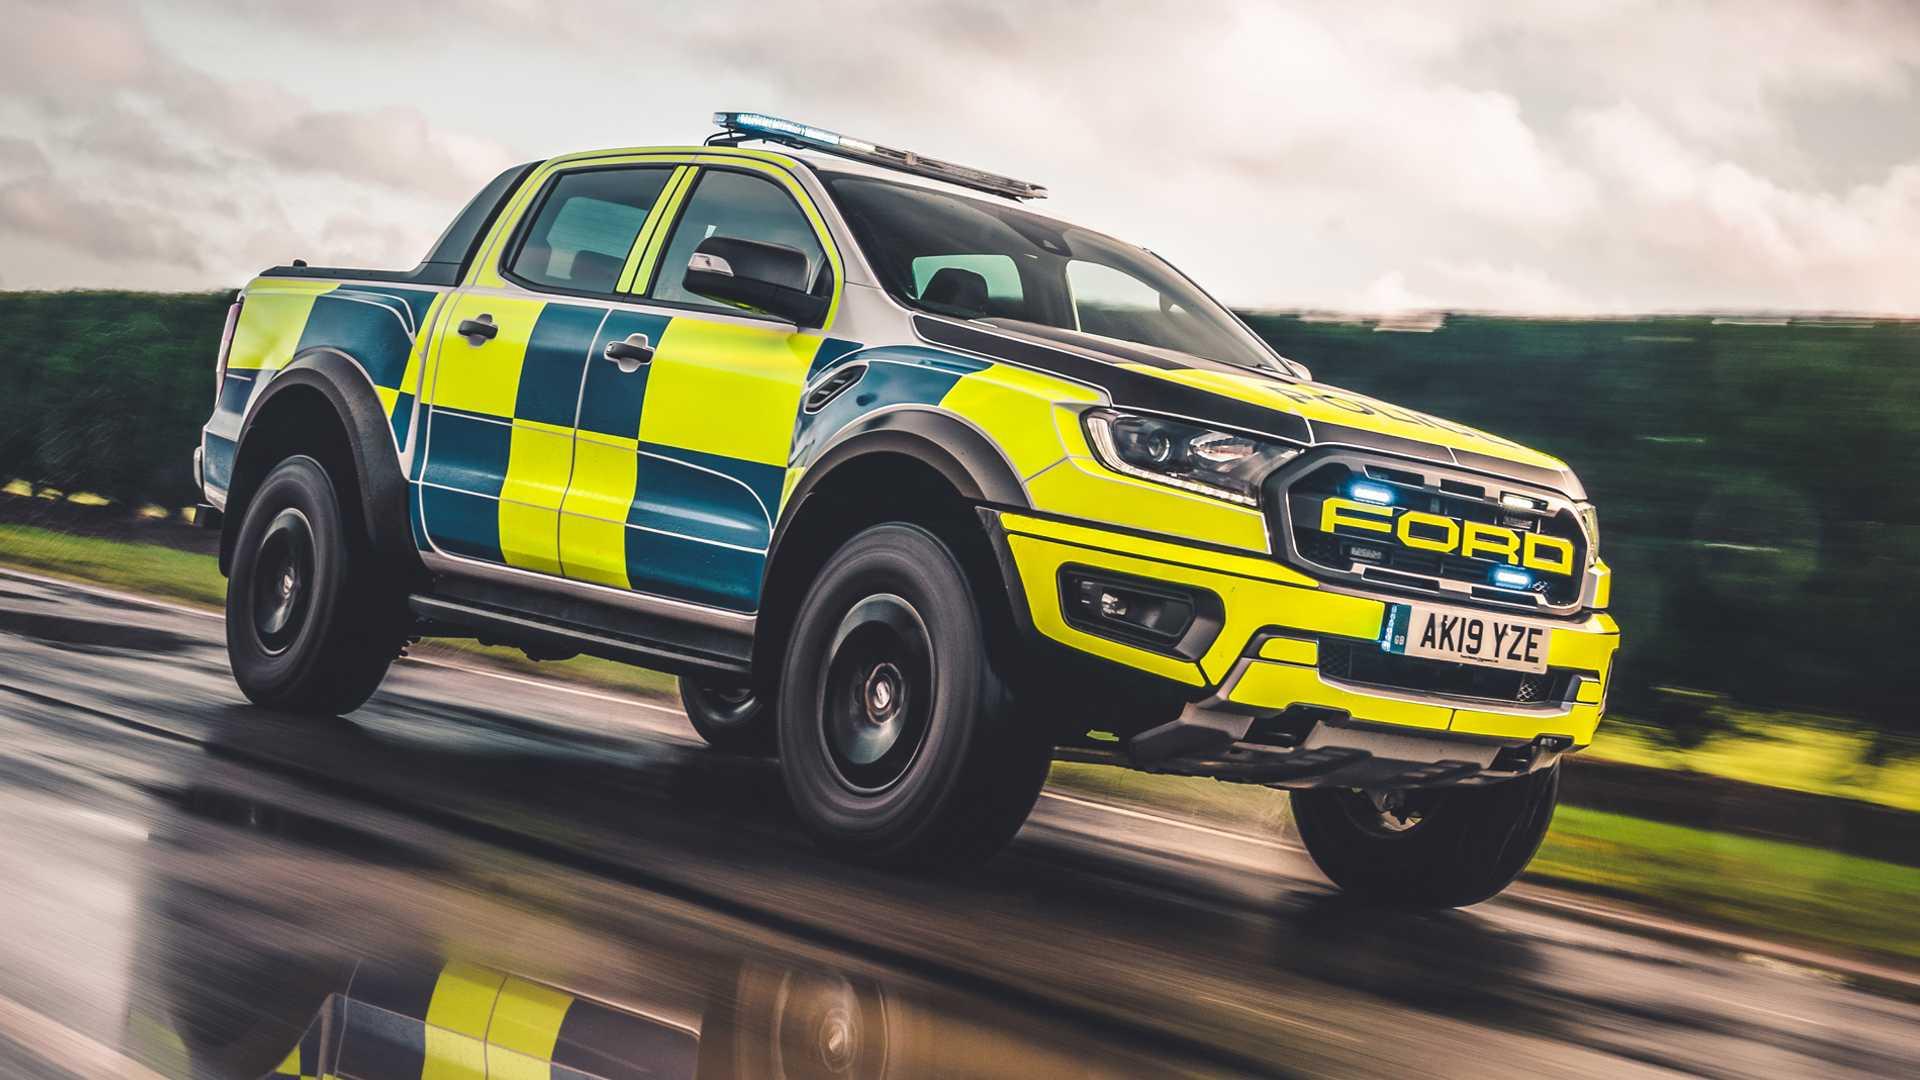 Ford-Focus-ST-and-Ranger-Raptor-UK-police-cars-11